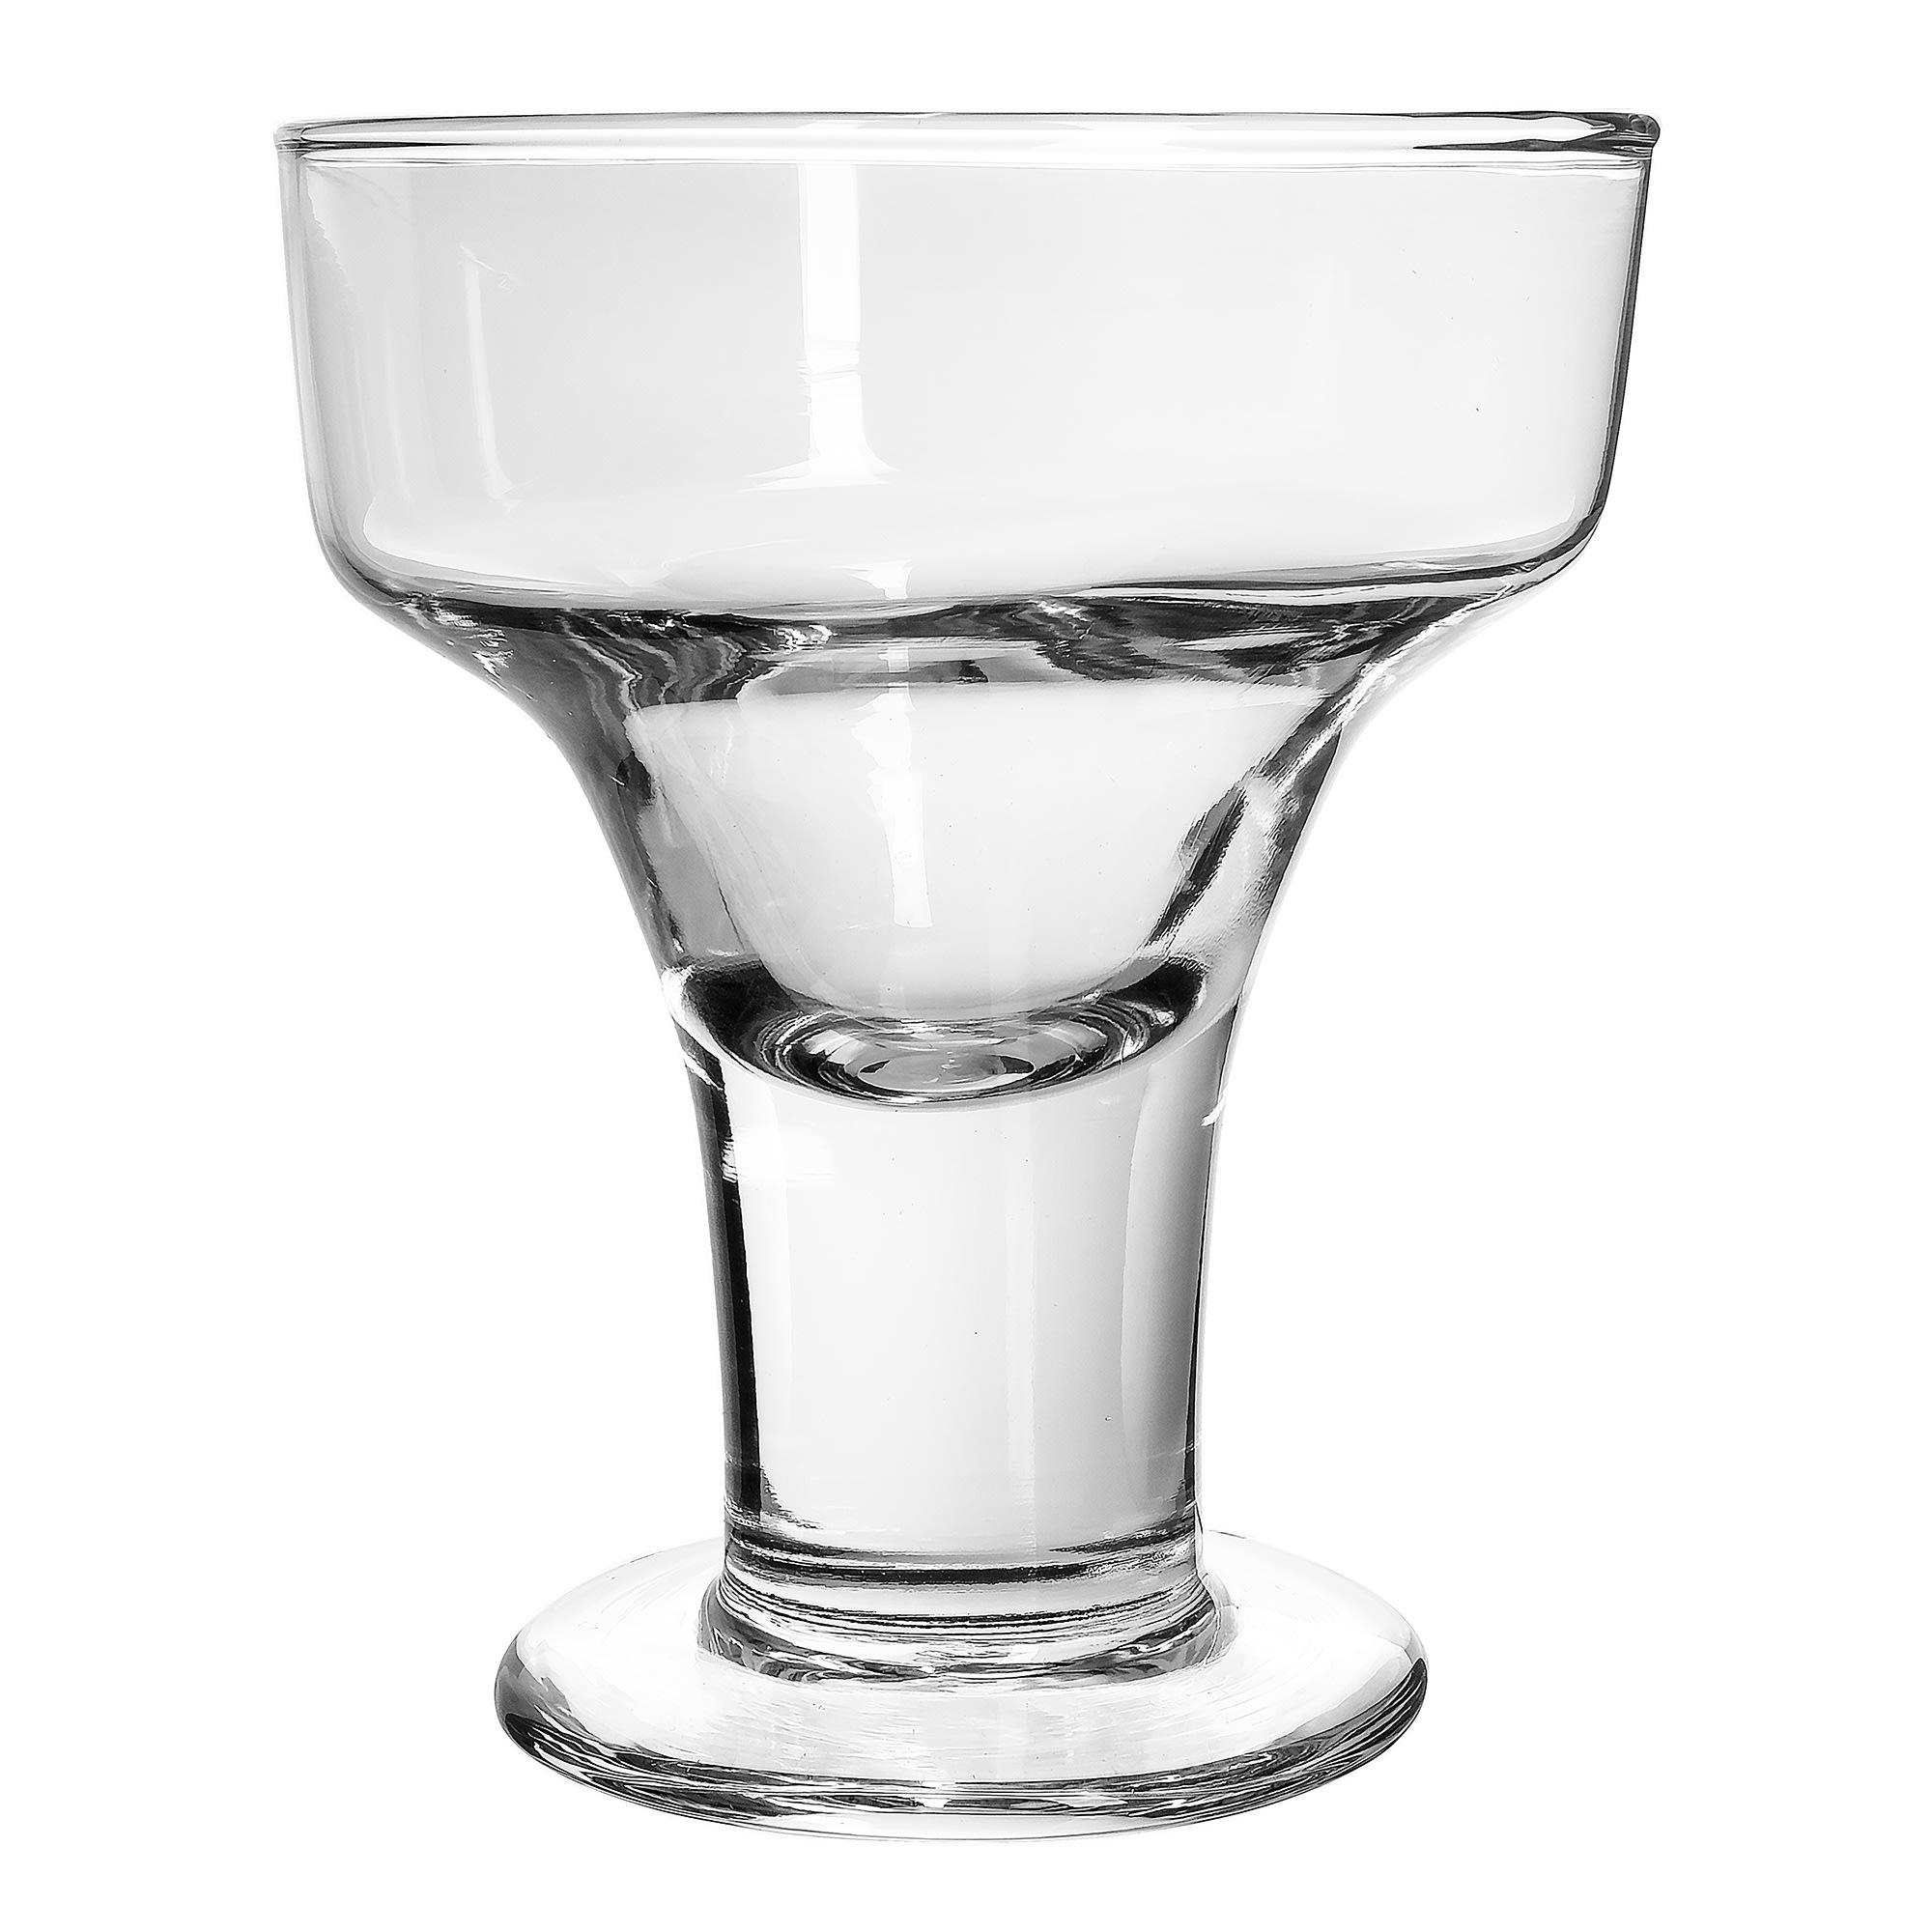 Libbey 3827 12-oz Catalina Margarita Dessert Glass - Safedge Rim & Foot